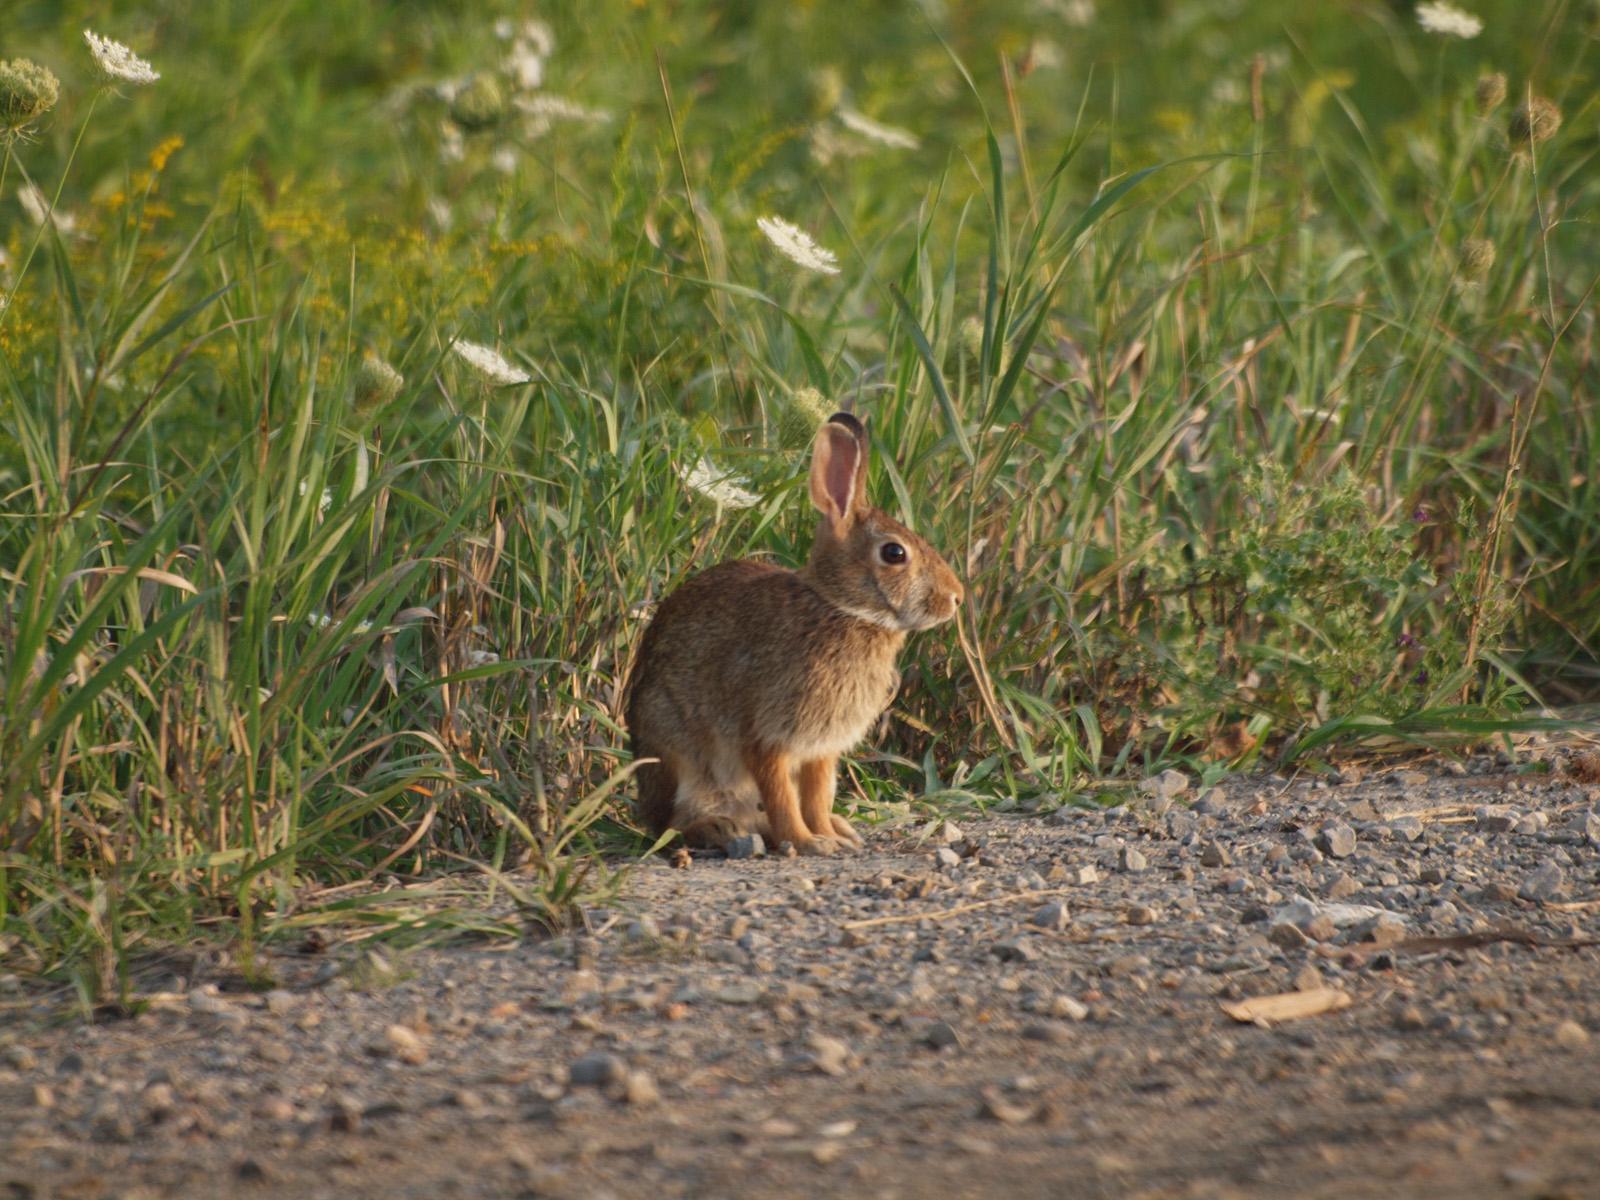 Cottontail rabbit habitat - photo#11